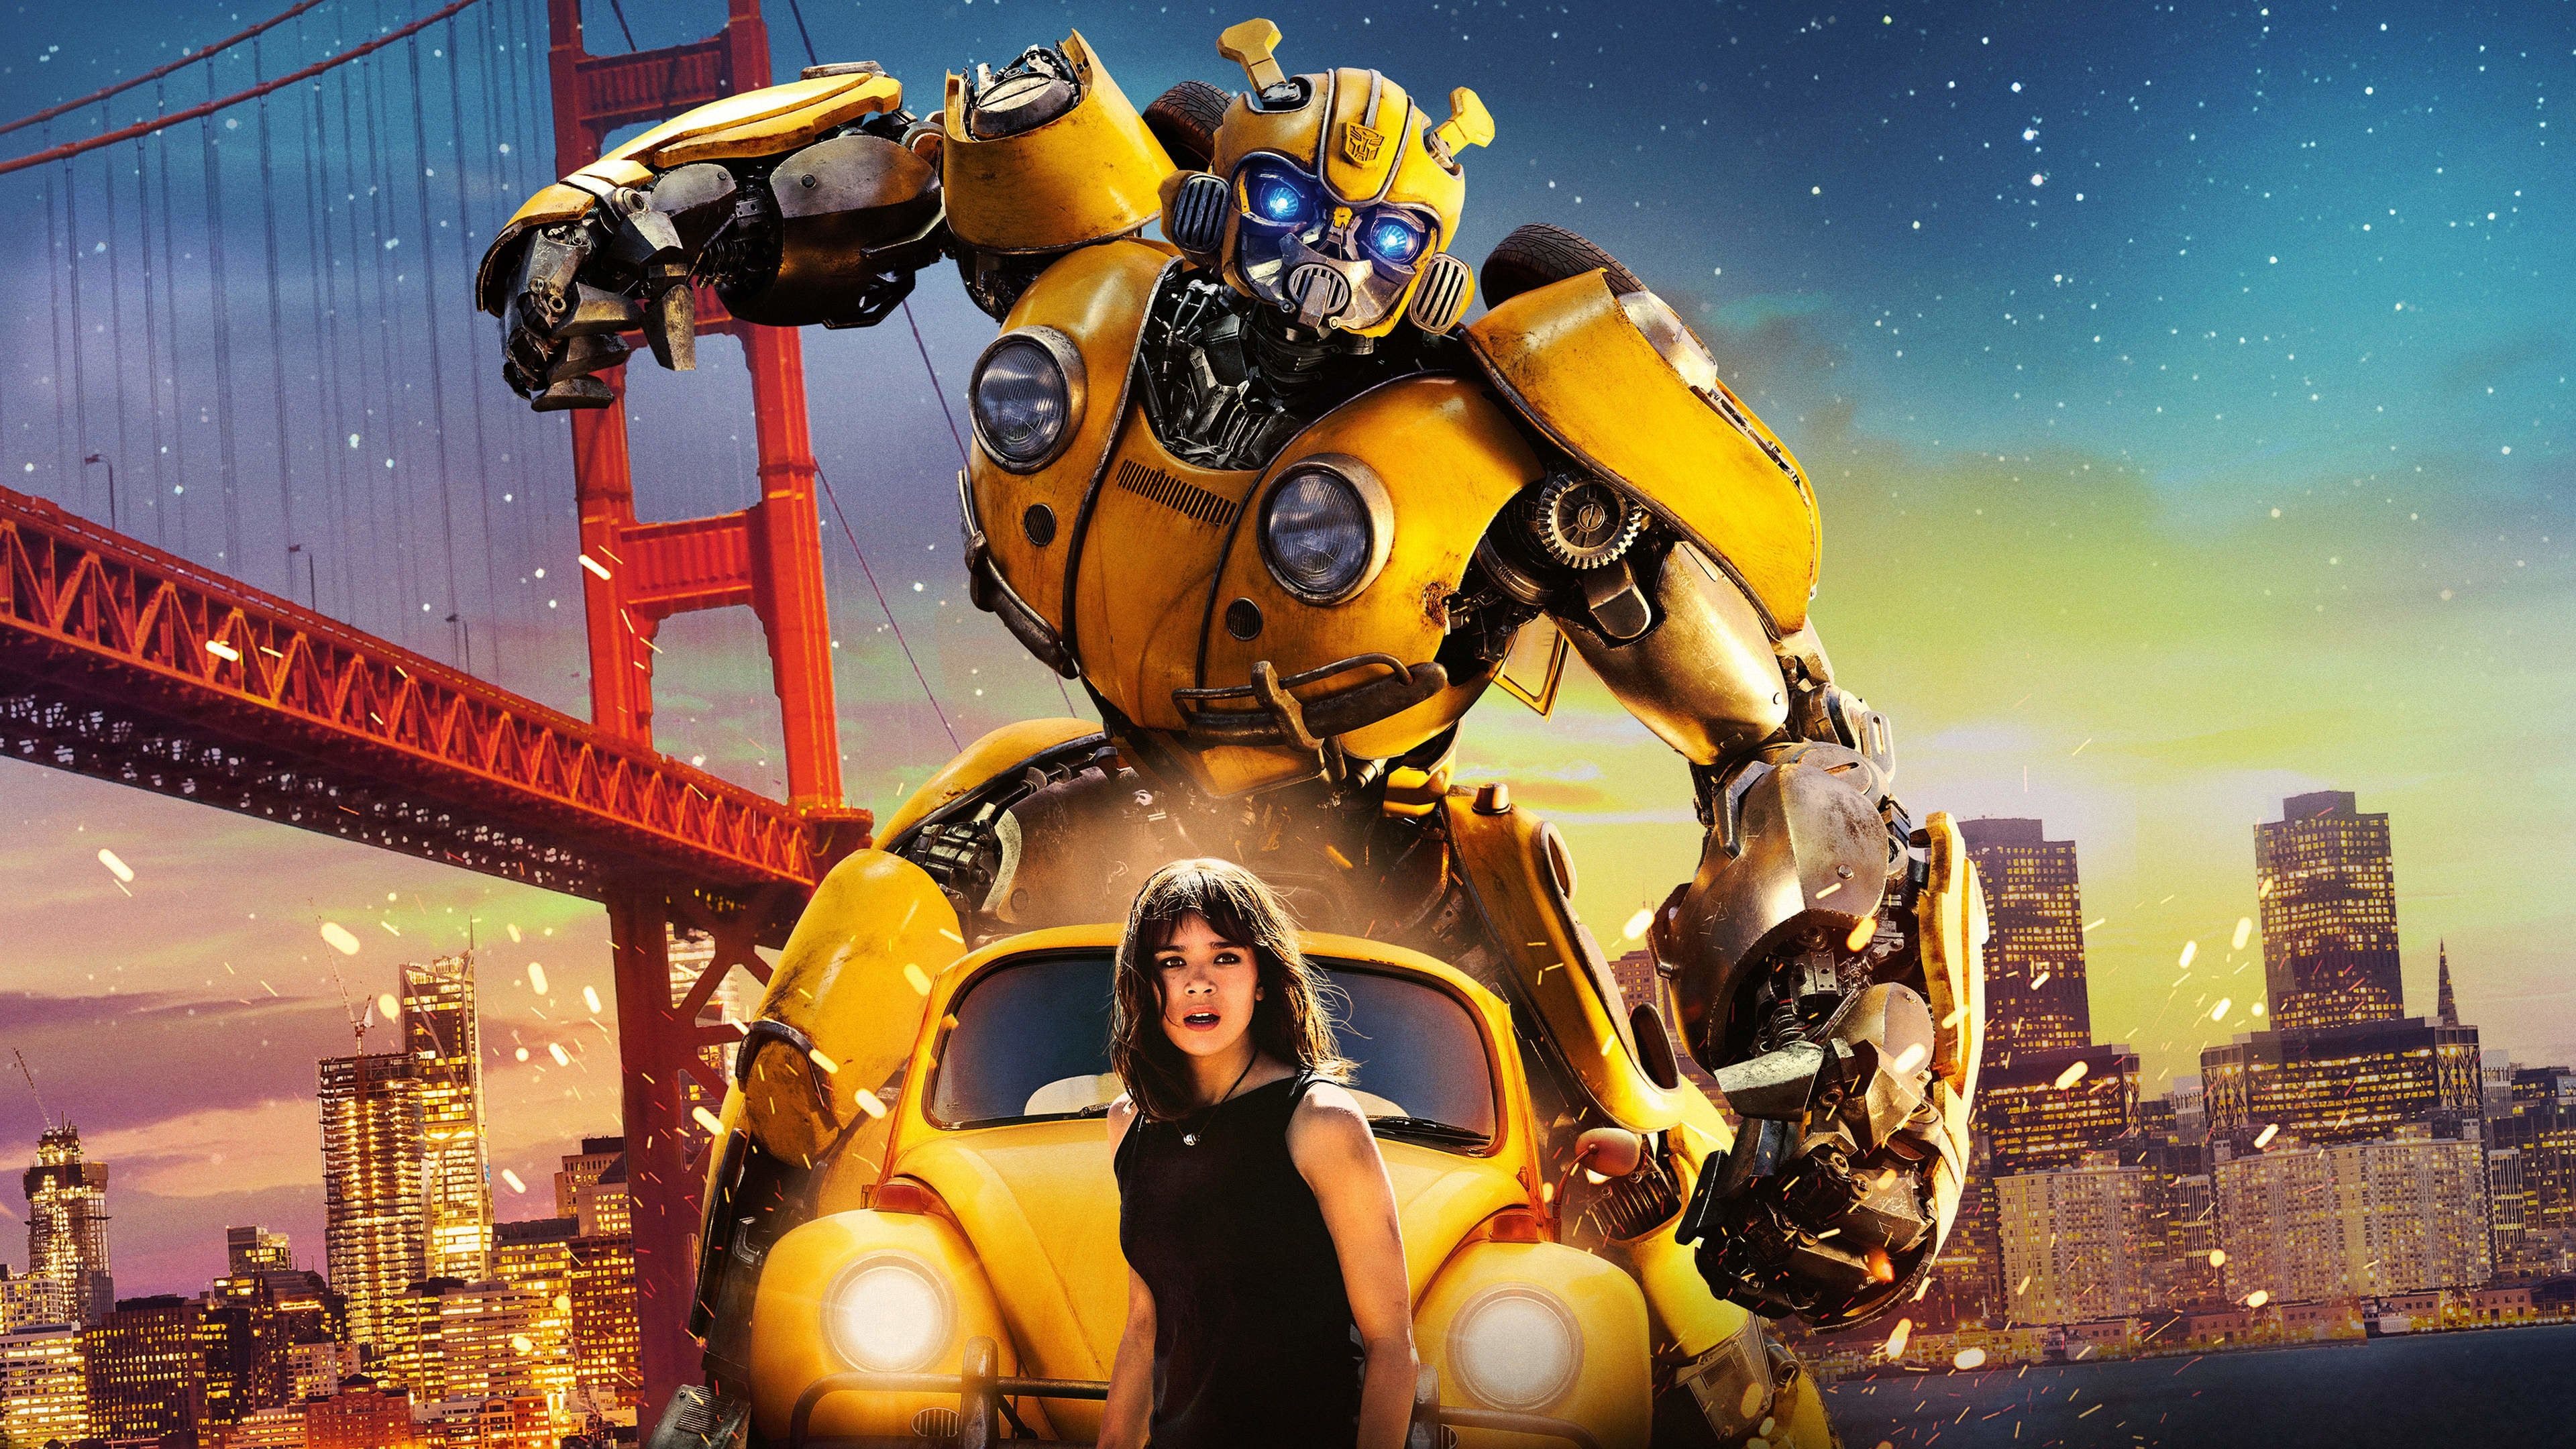 Ver Bumblebee Pelicula Hd Streaming Movies Online Streaming Movies Hd Movies